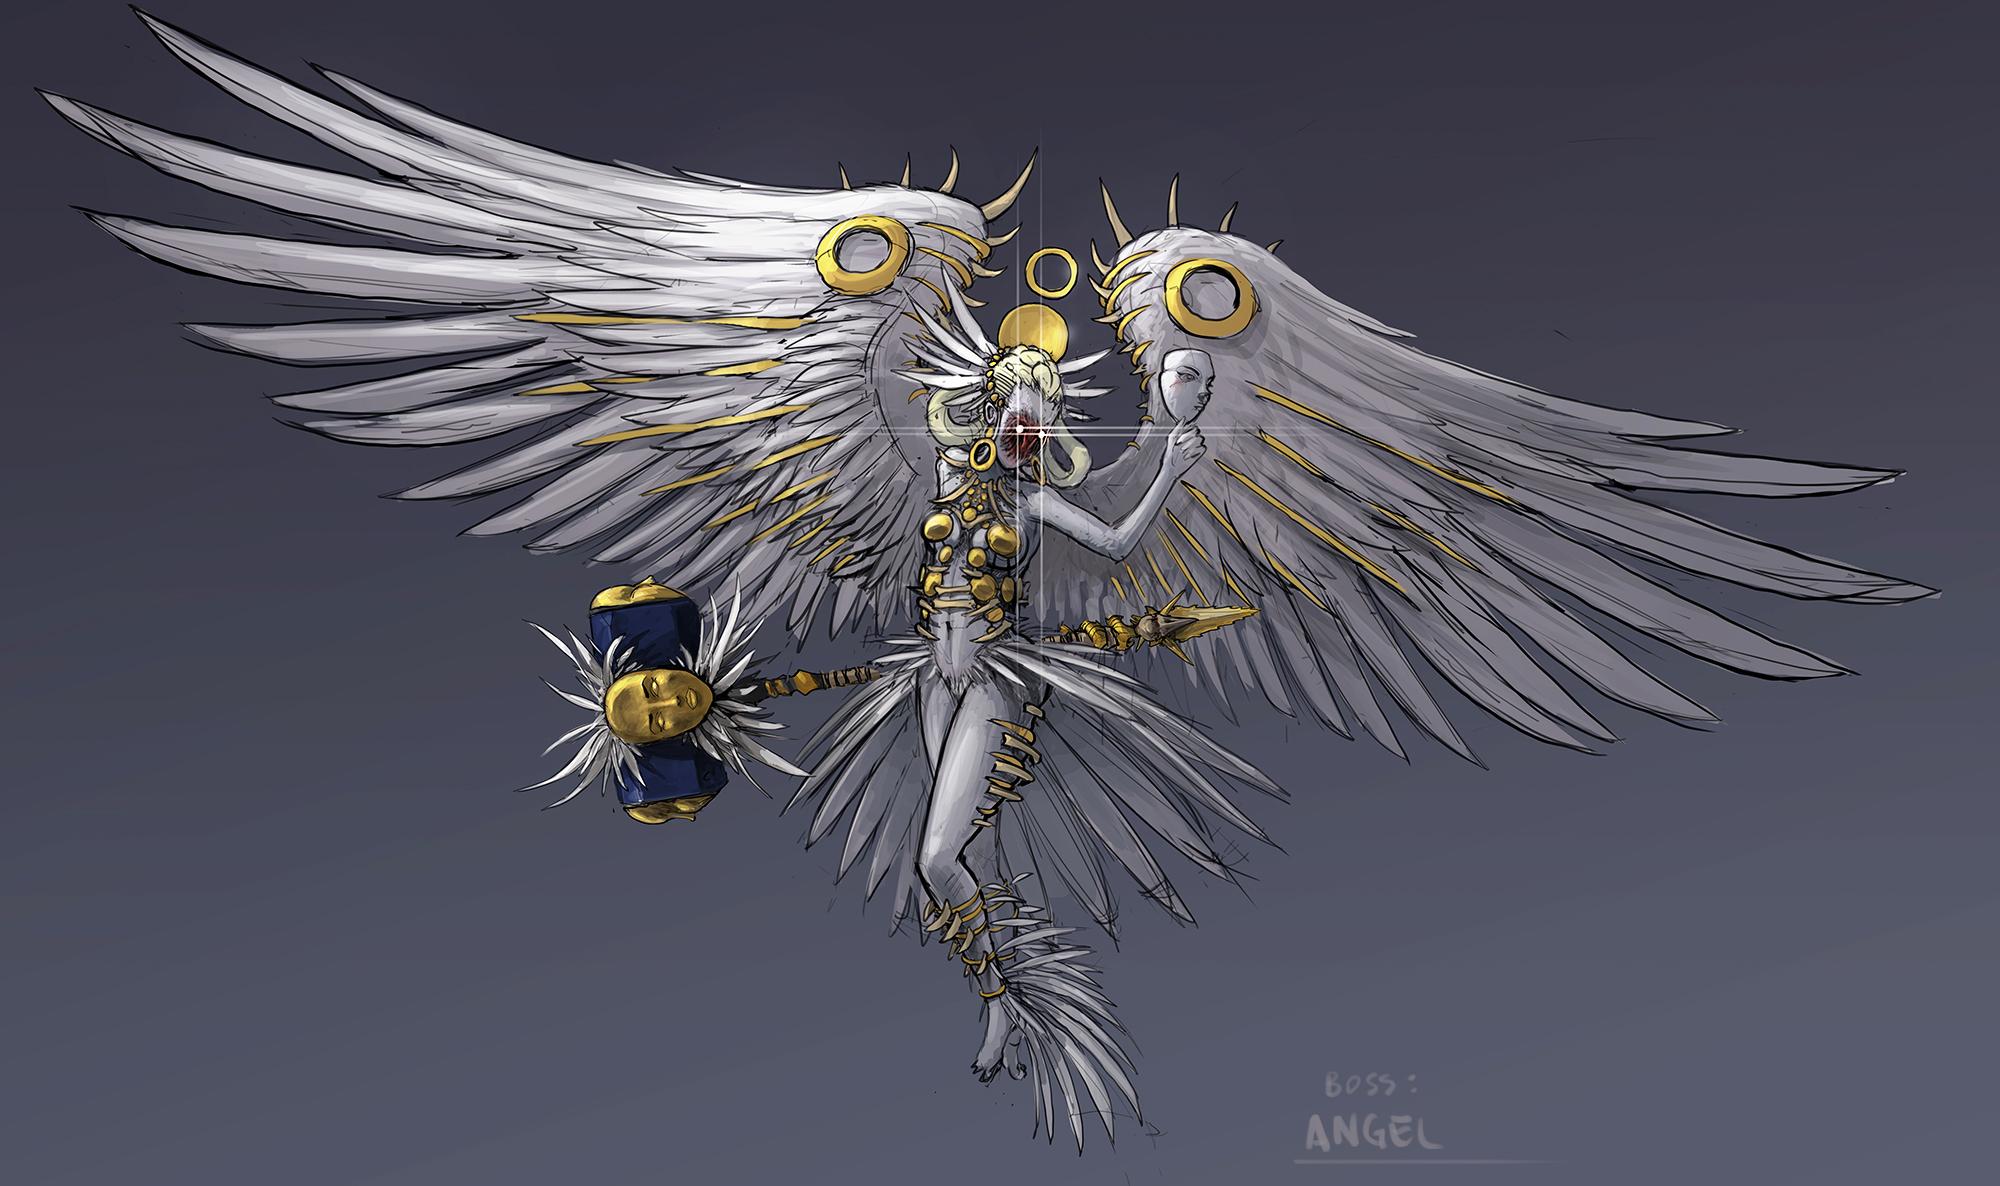 Angel_b_1.jpg